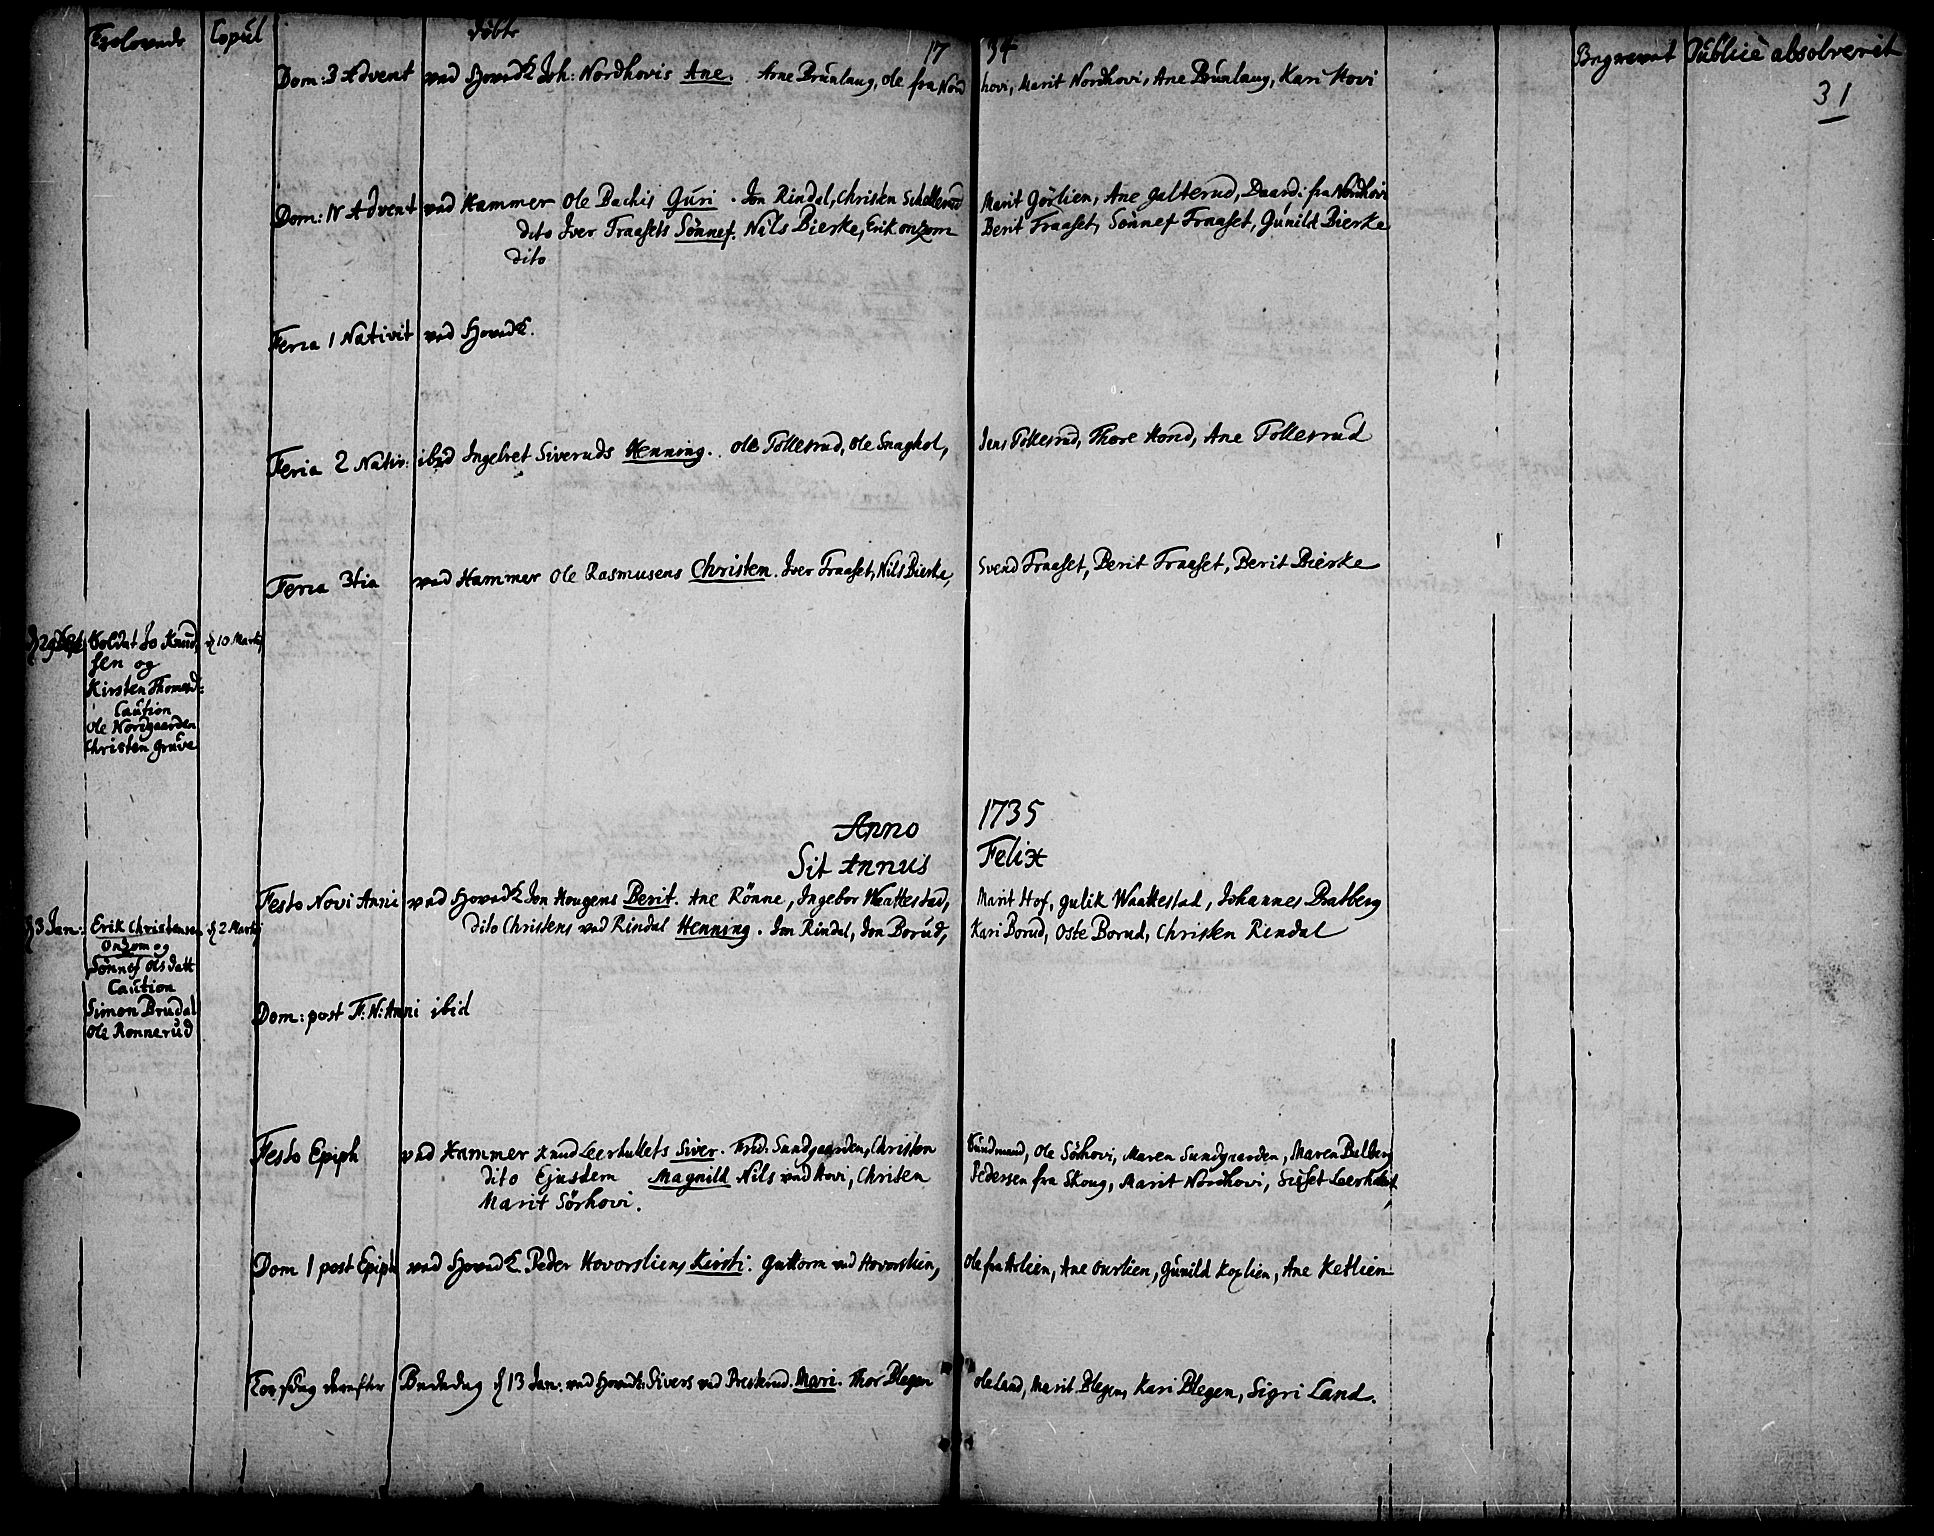 SAH, Fåberg prestekontor, Ministerialbok nr. 1, 1727-1775, s. 31